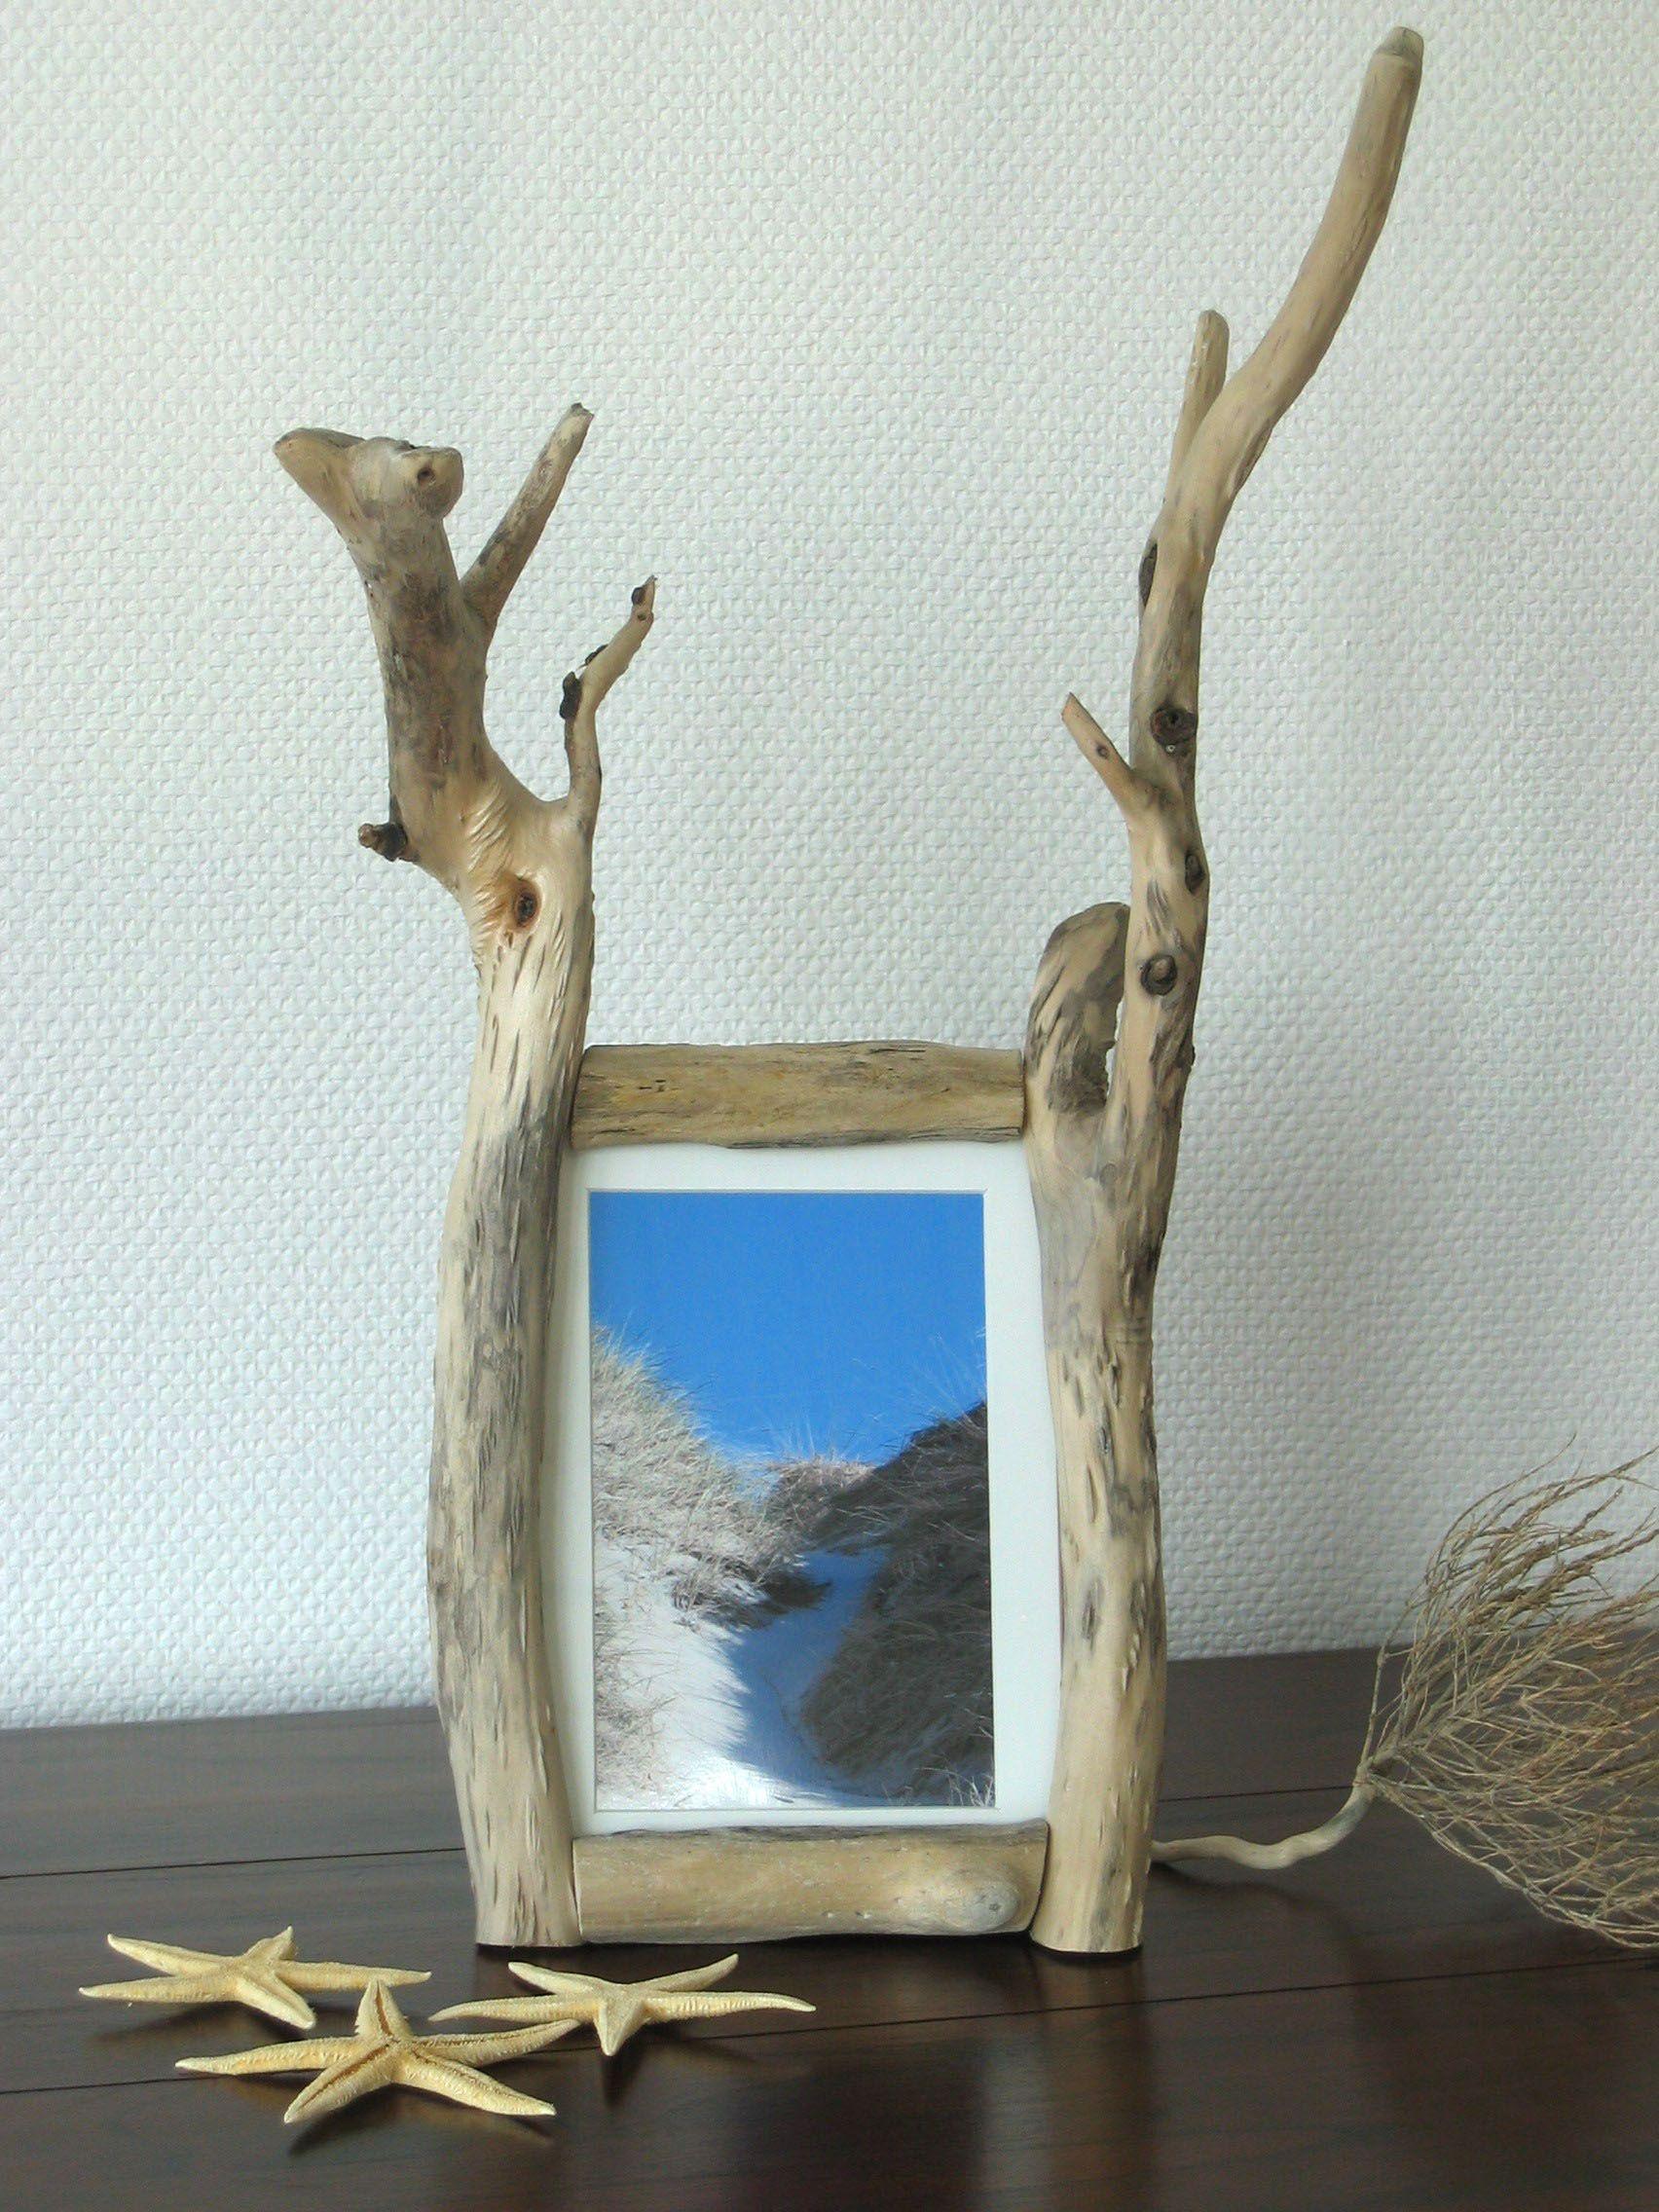 treibholz bilderrahmen driftwood picture frame charlie pinterest driftwood pallets and. Black Bedroom Furniture Sets. Home Design Ideas